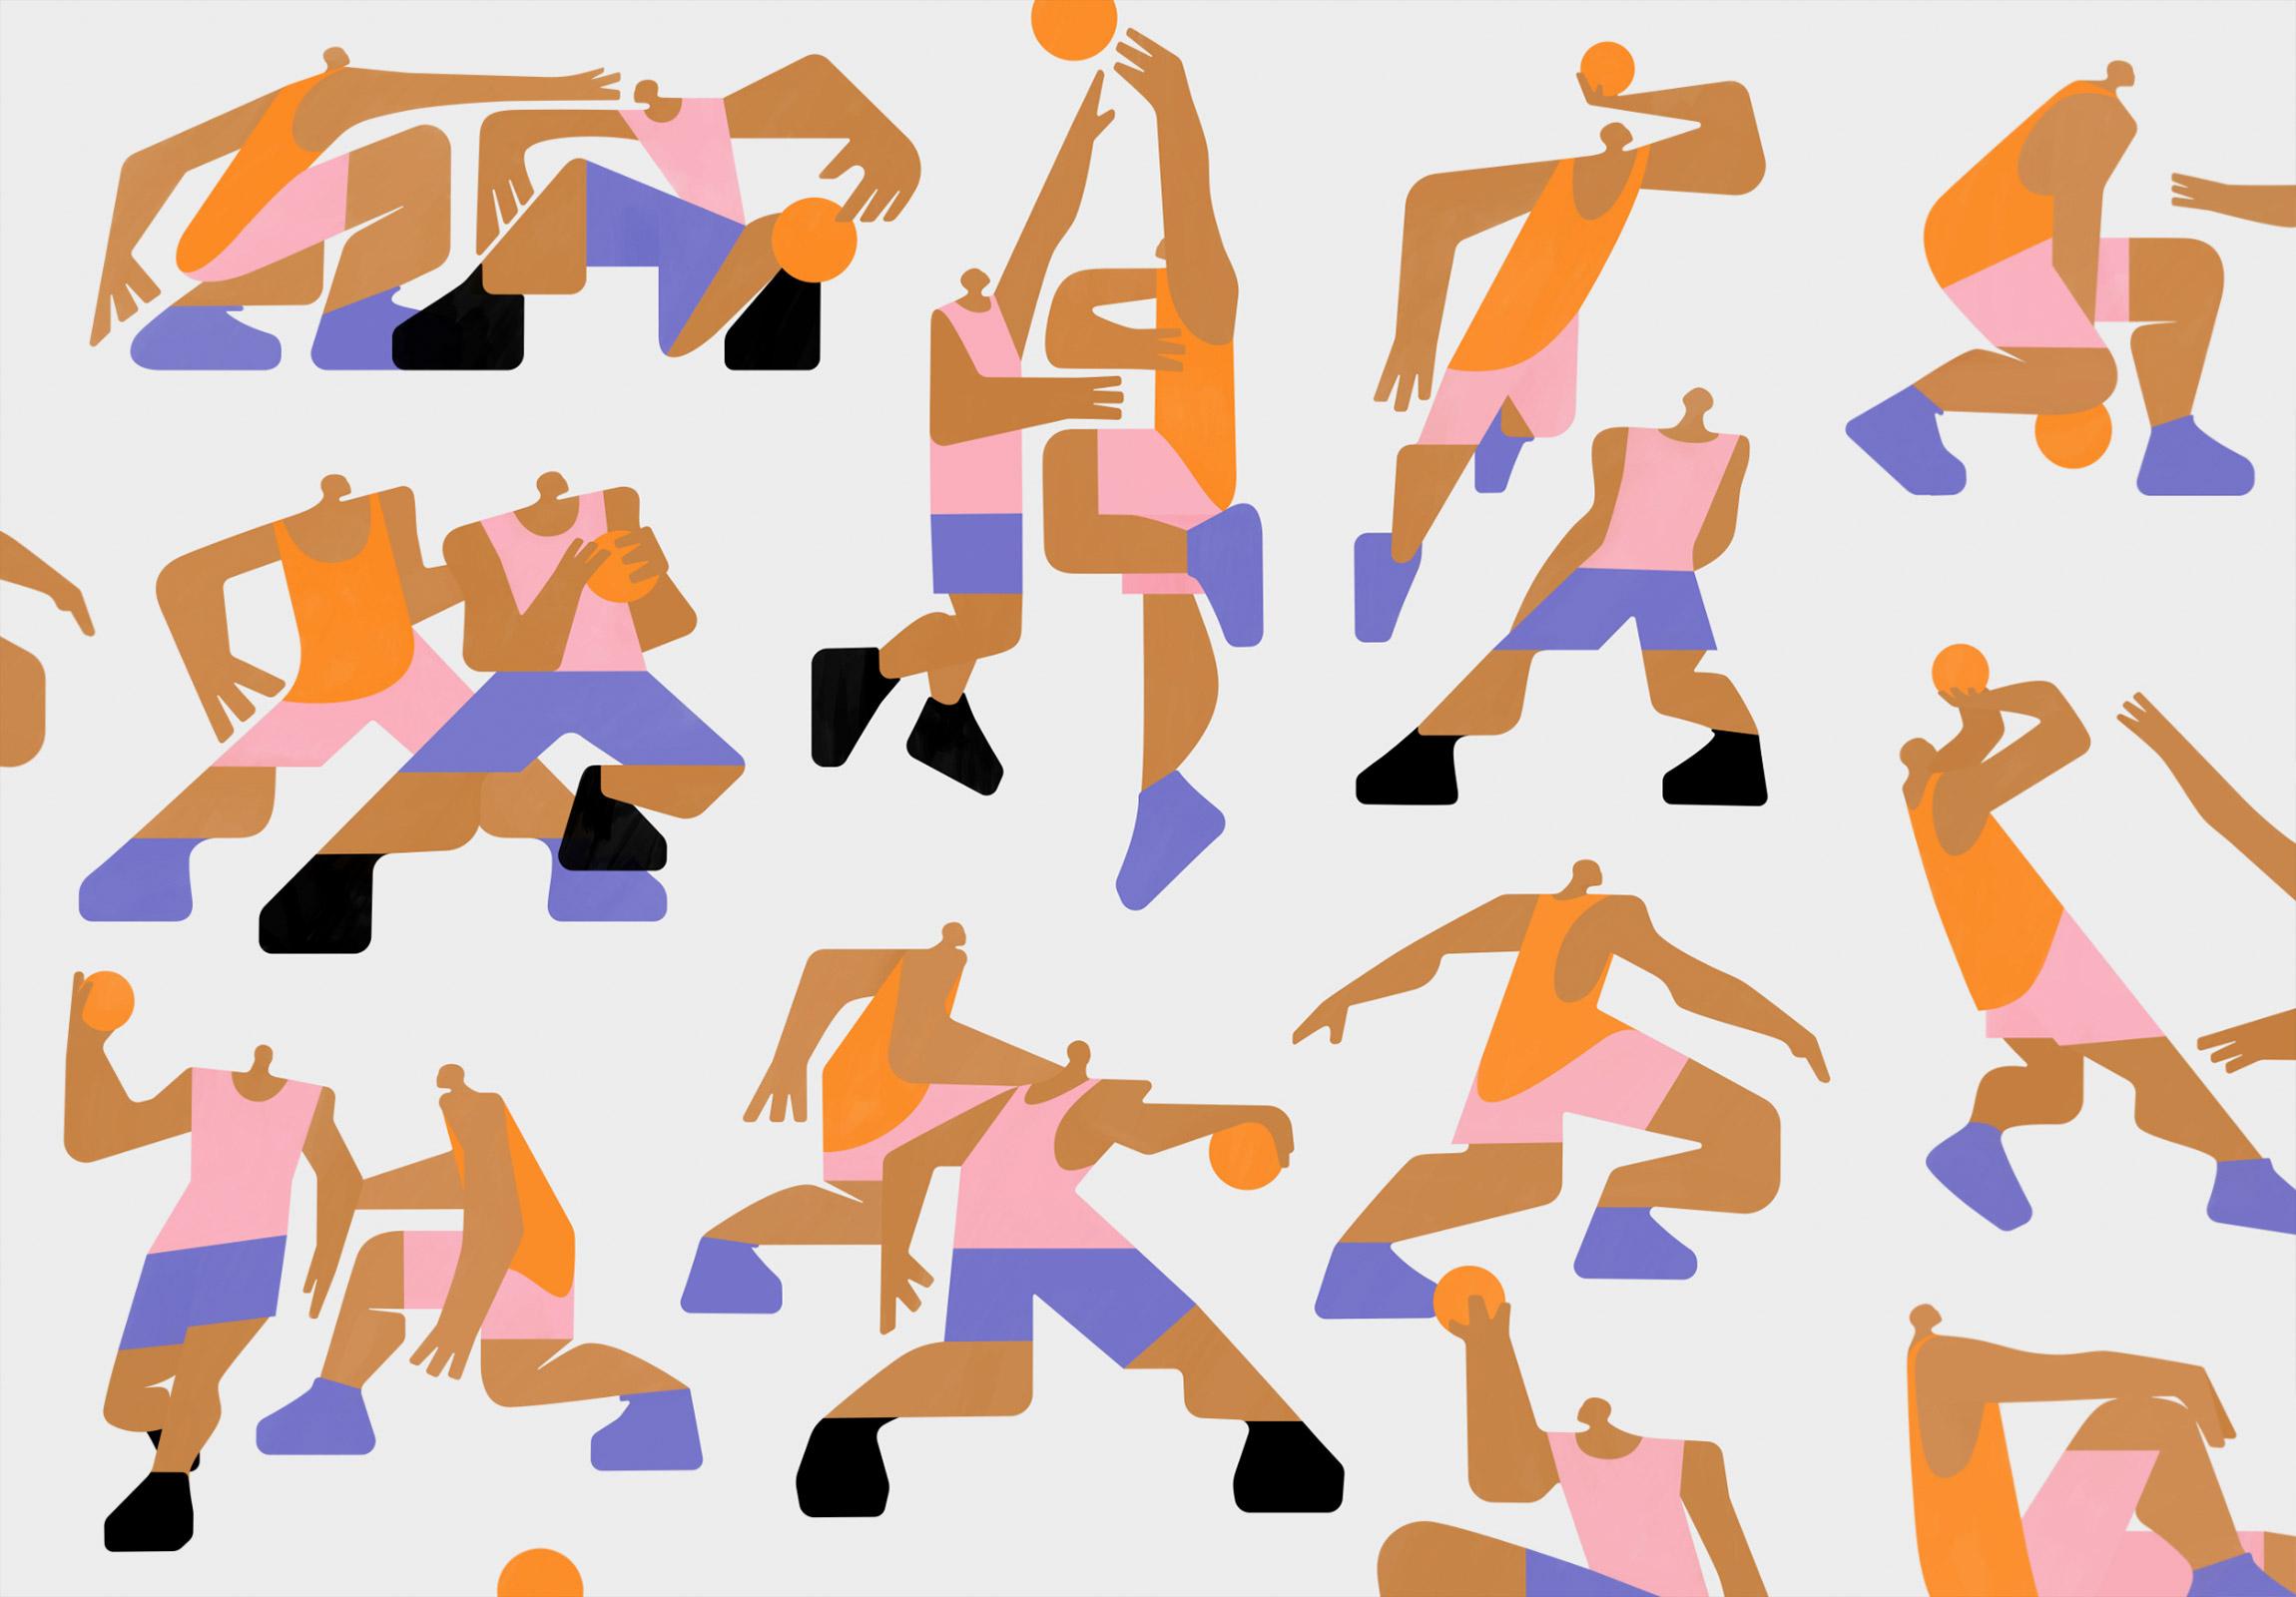 Gabe_Illustration_Slide_03